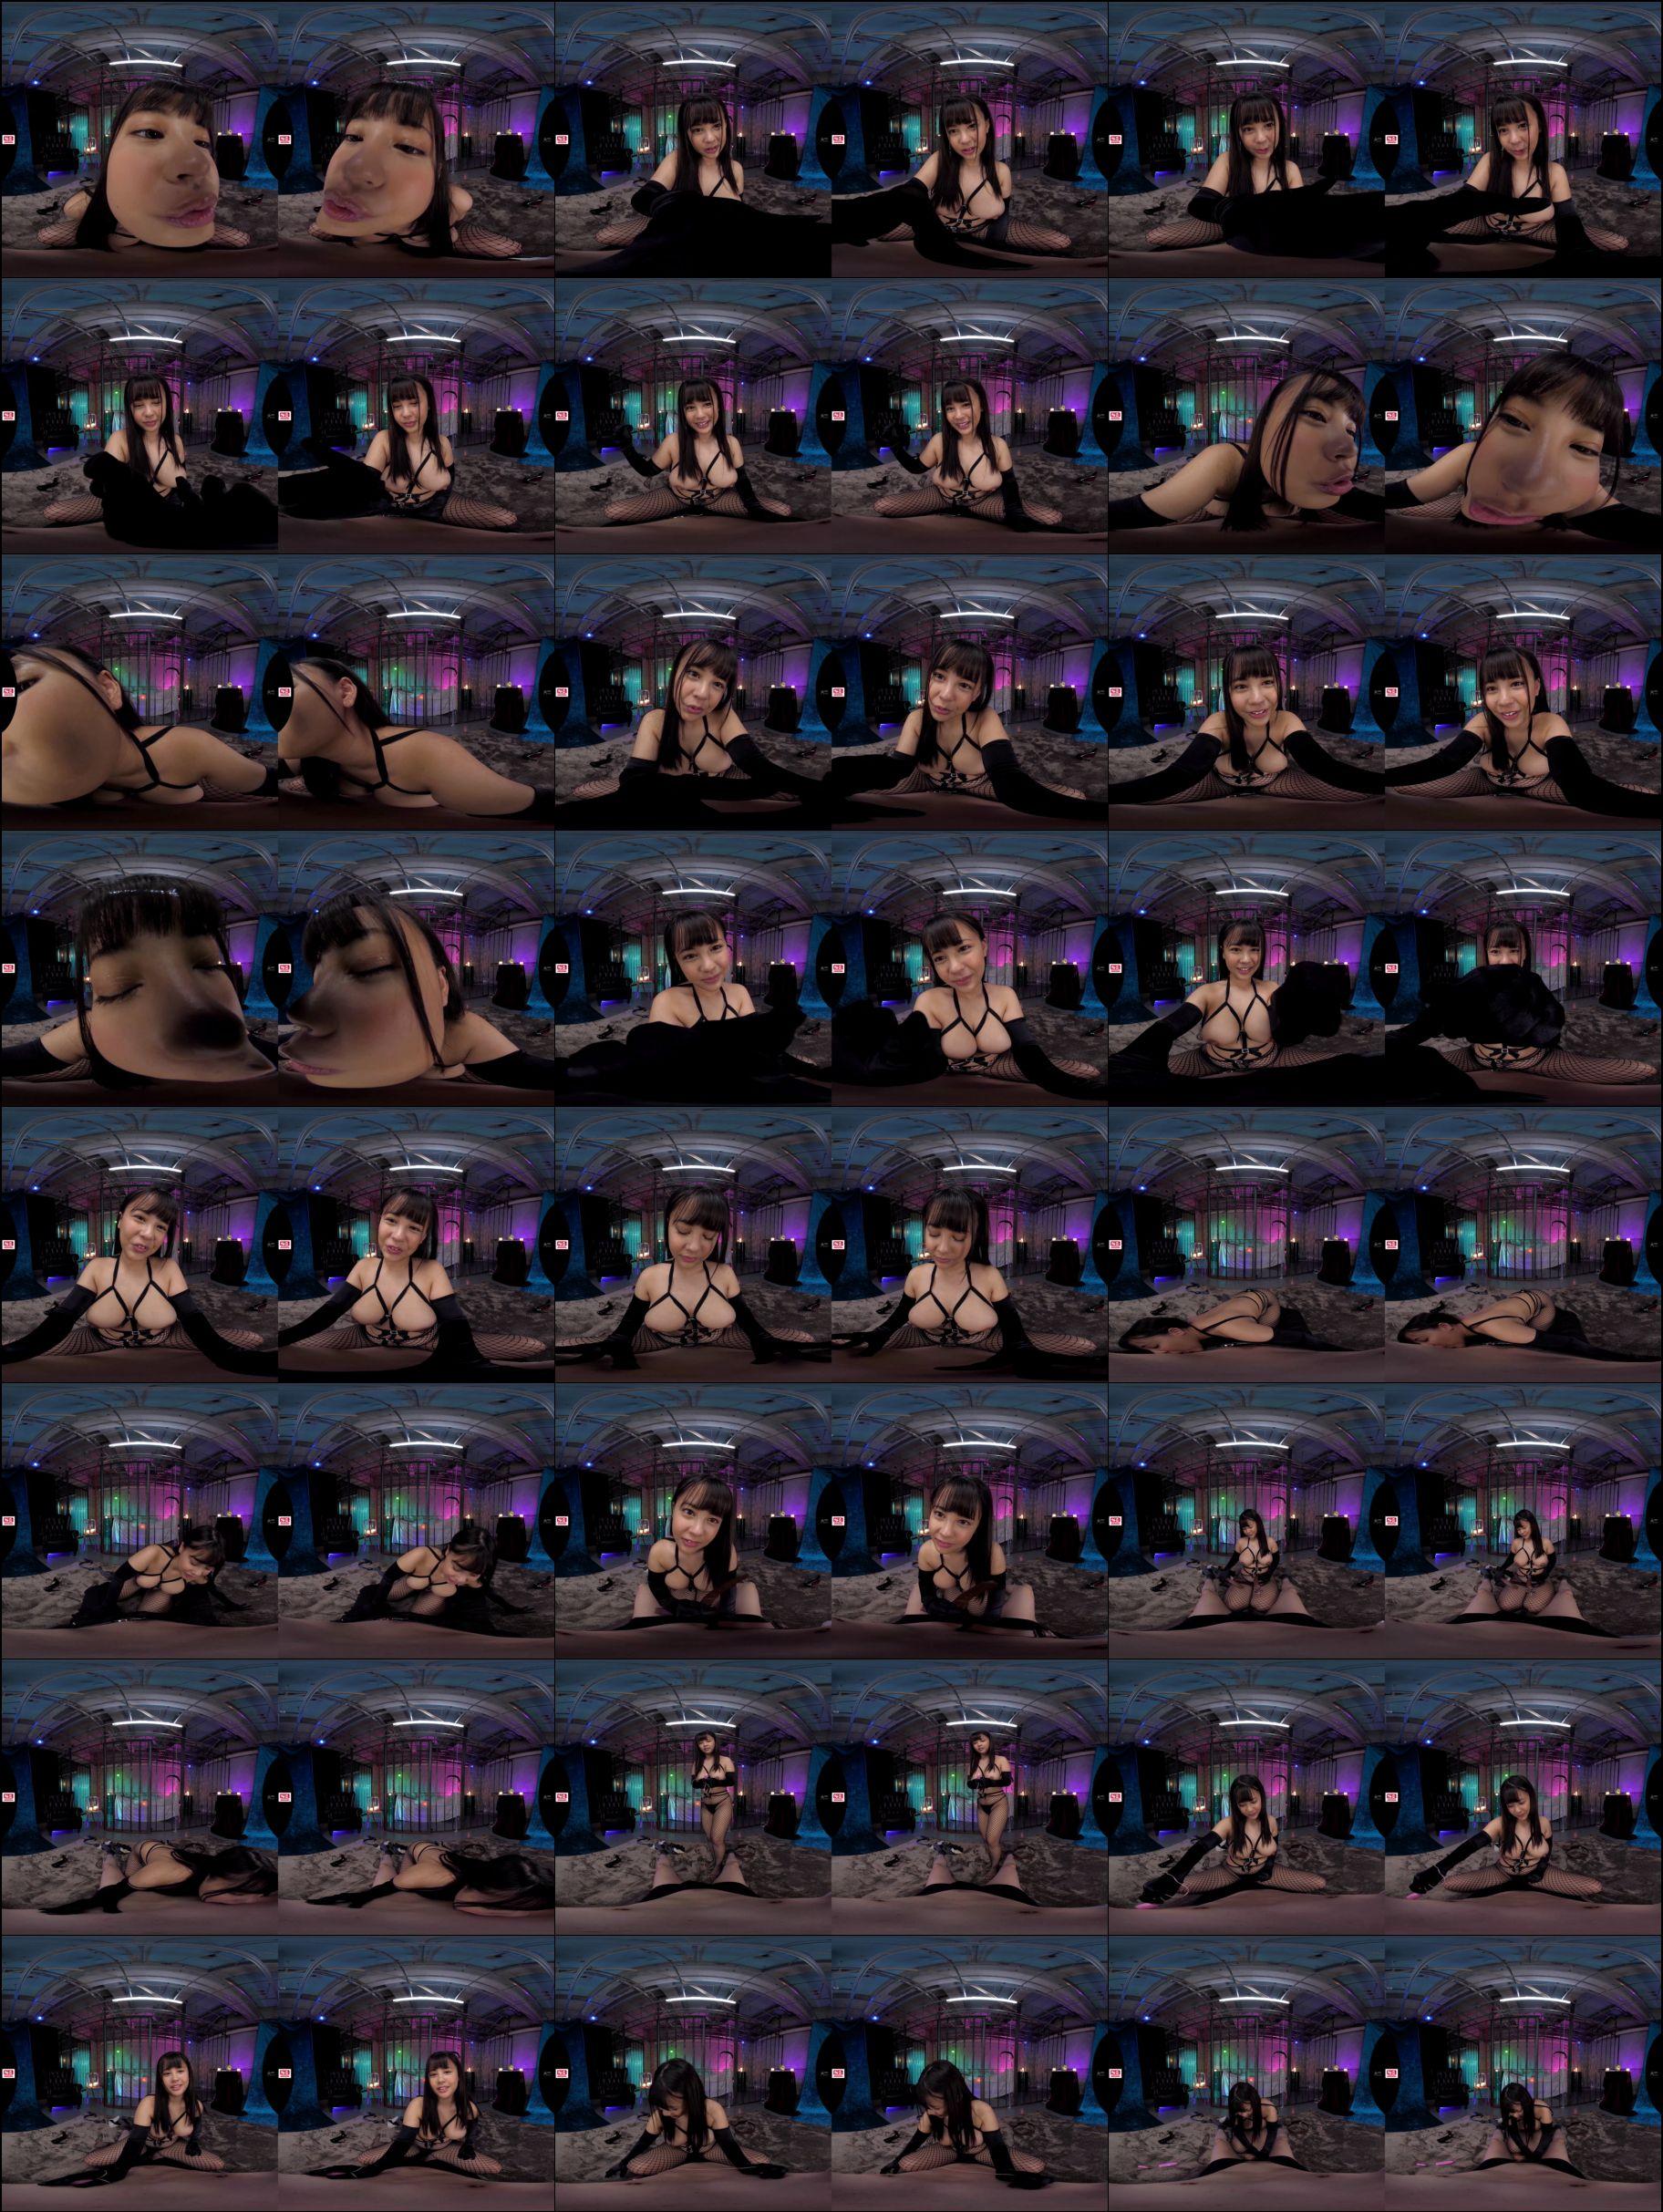 SIVR-088_B_-_Shion_Yumi_-_The_Ultimate_Cock_Training_2048p_180_sbs.jpeg